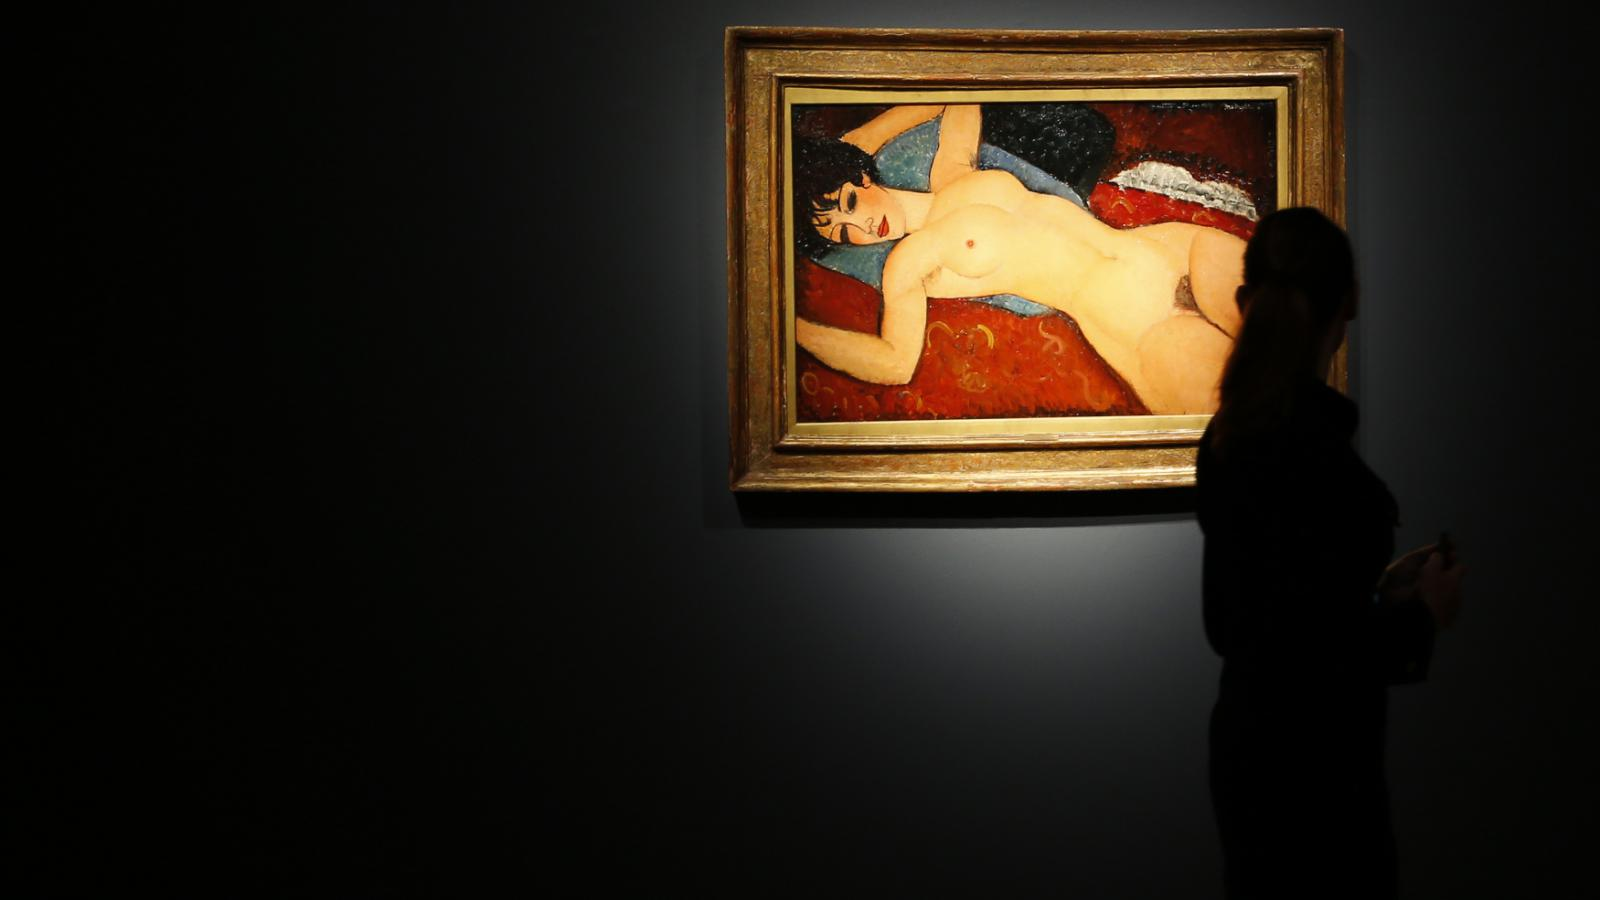 Obraz Amadea Modiglianiho Nu couché